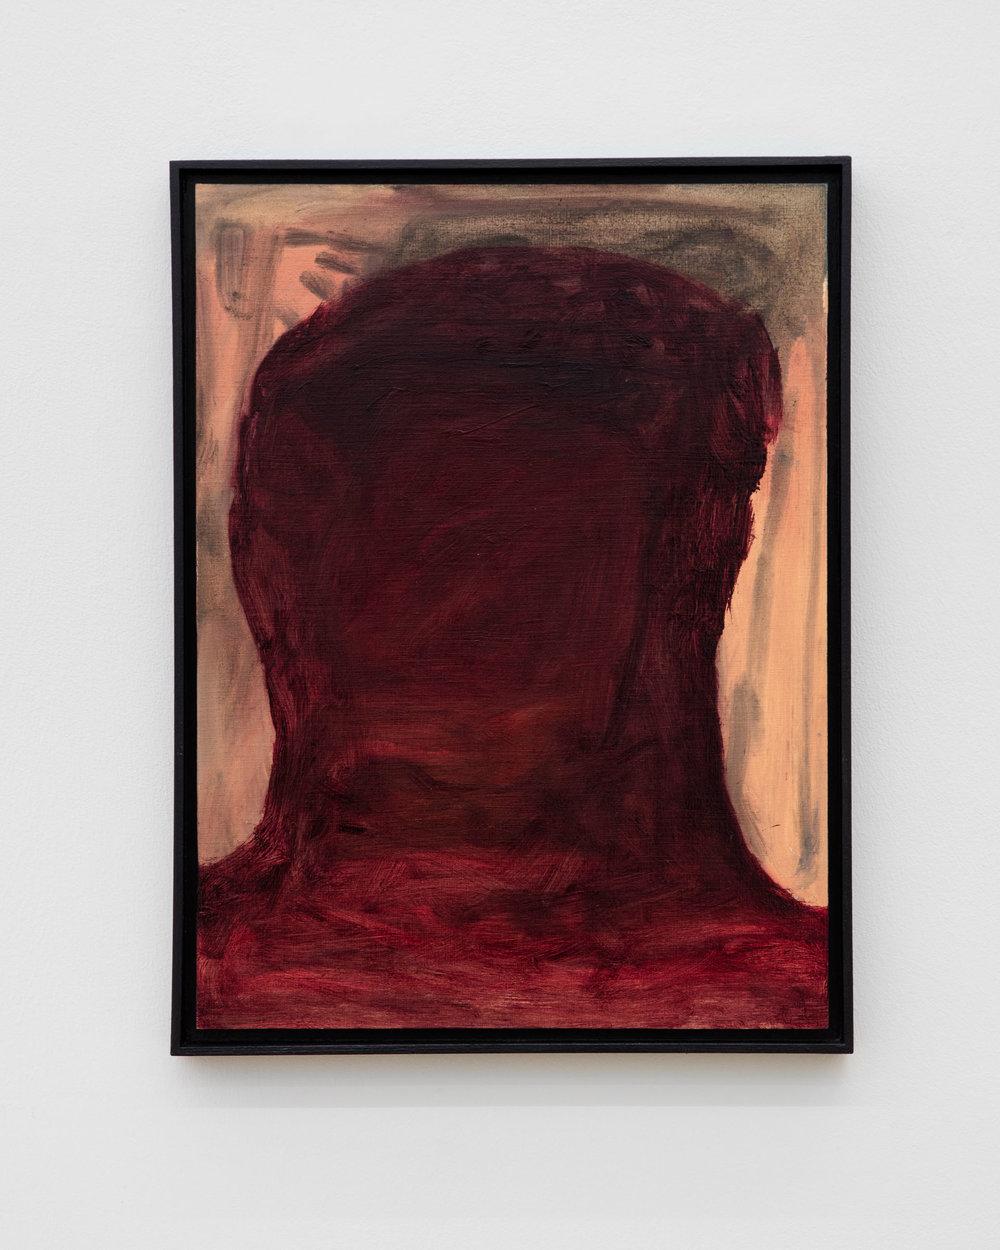 Veronika Hilger: Untitled, 2019, oil on paper on MDF in artists frame, 39,6 x 29,6 cm